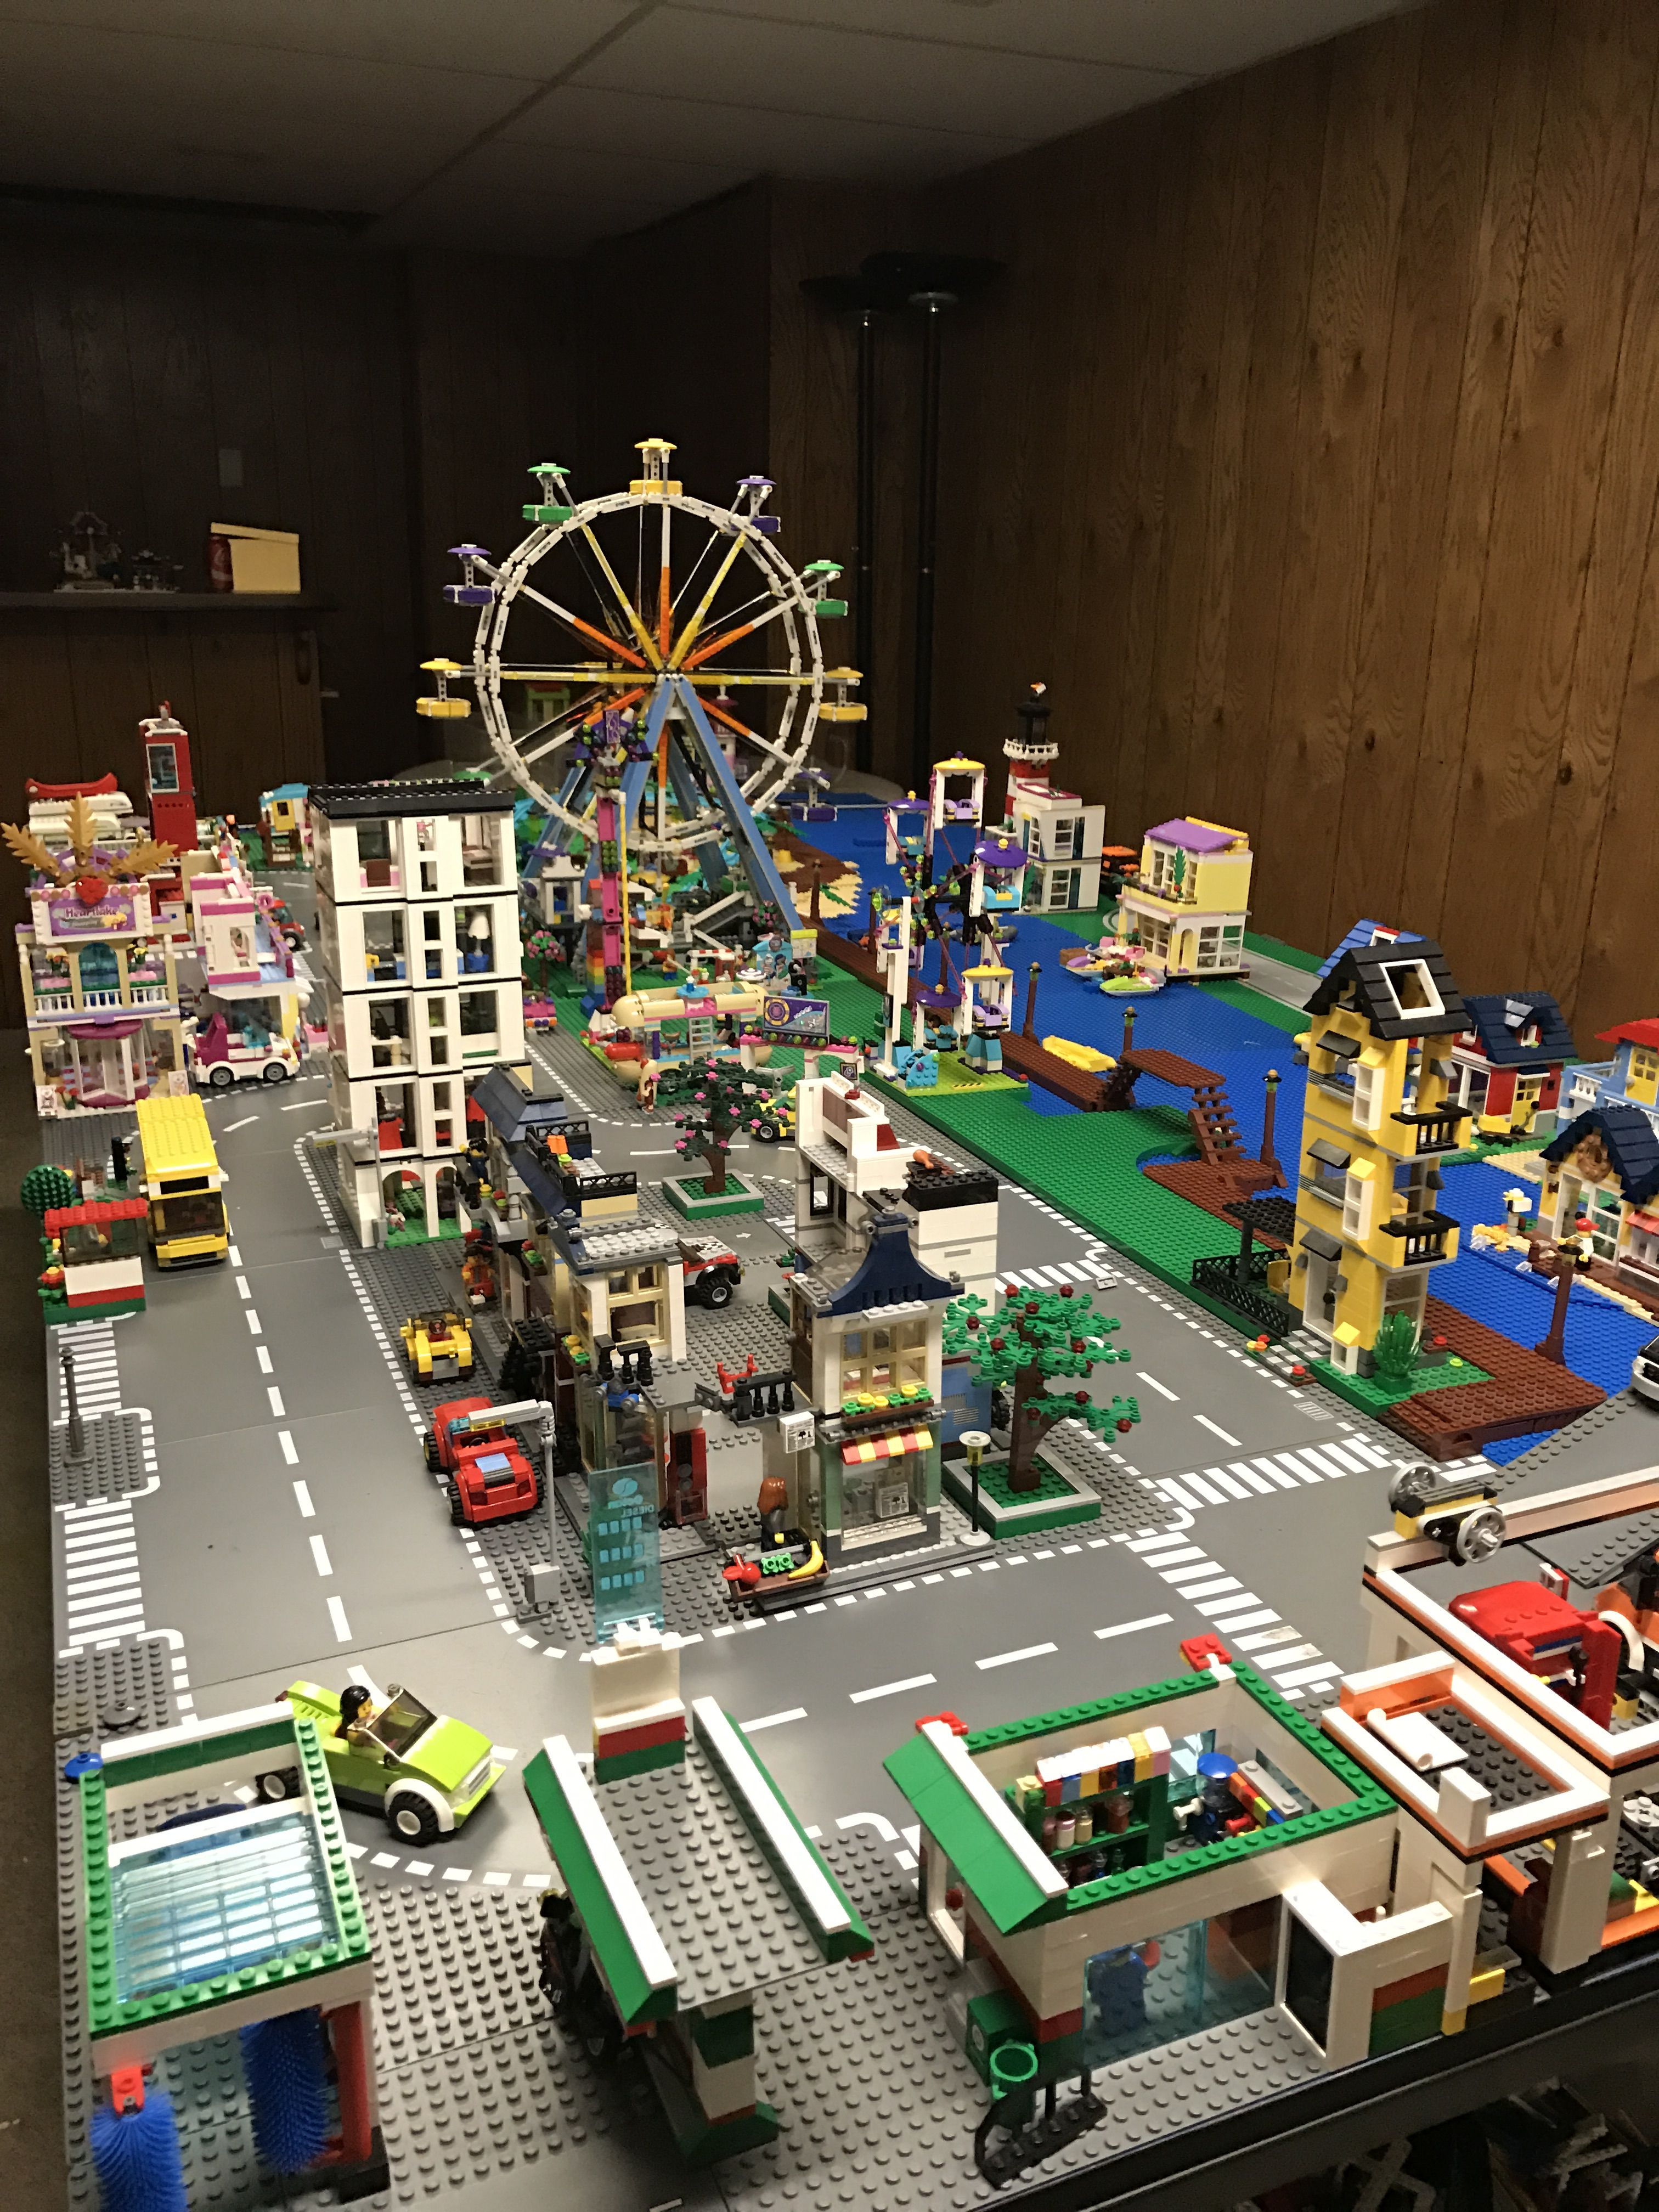 Lego city resort